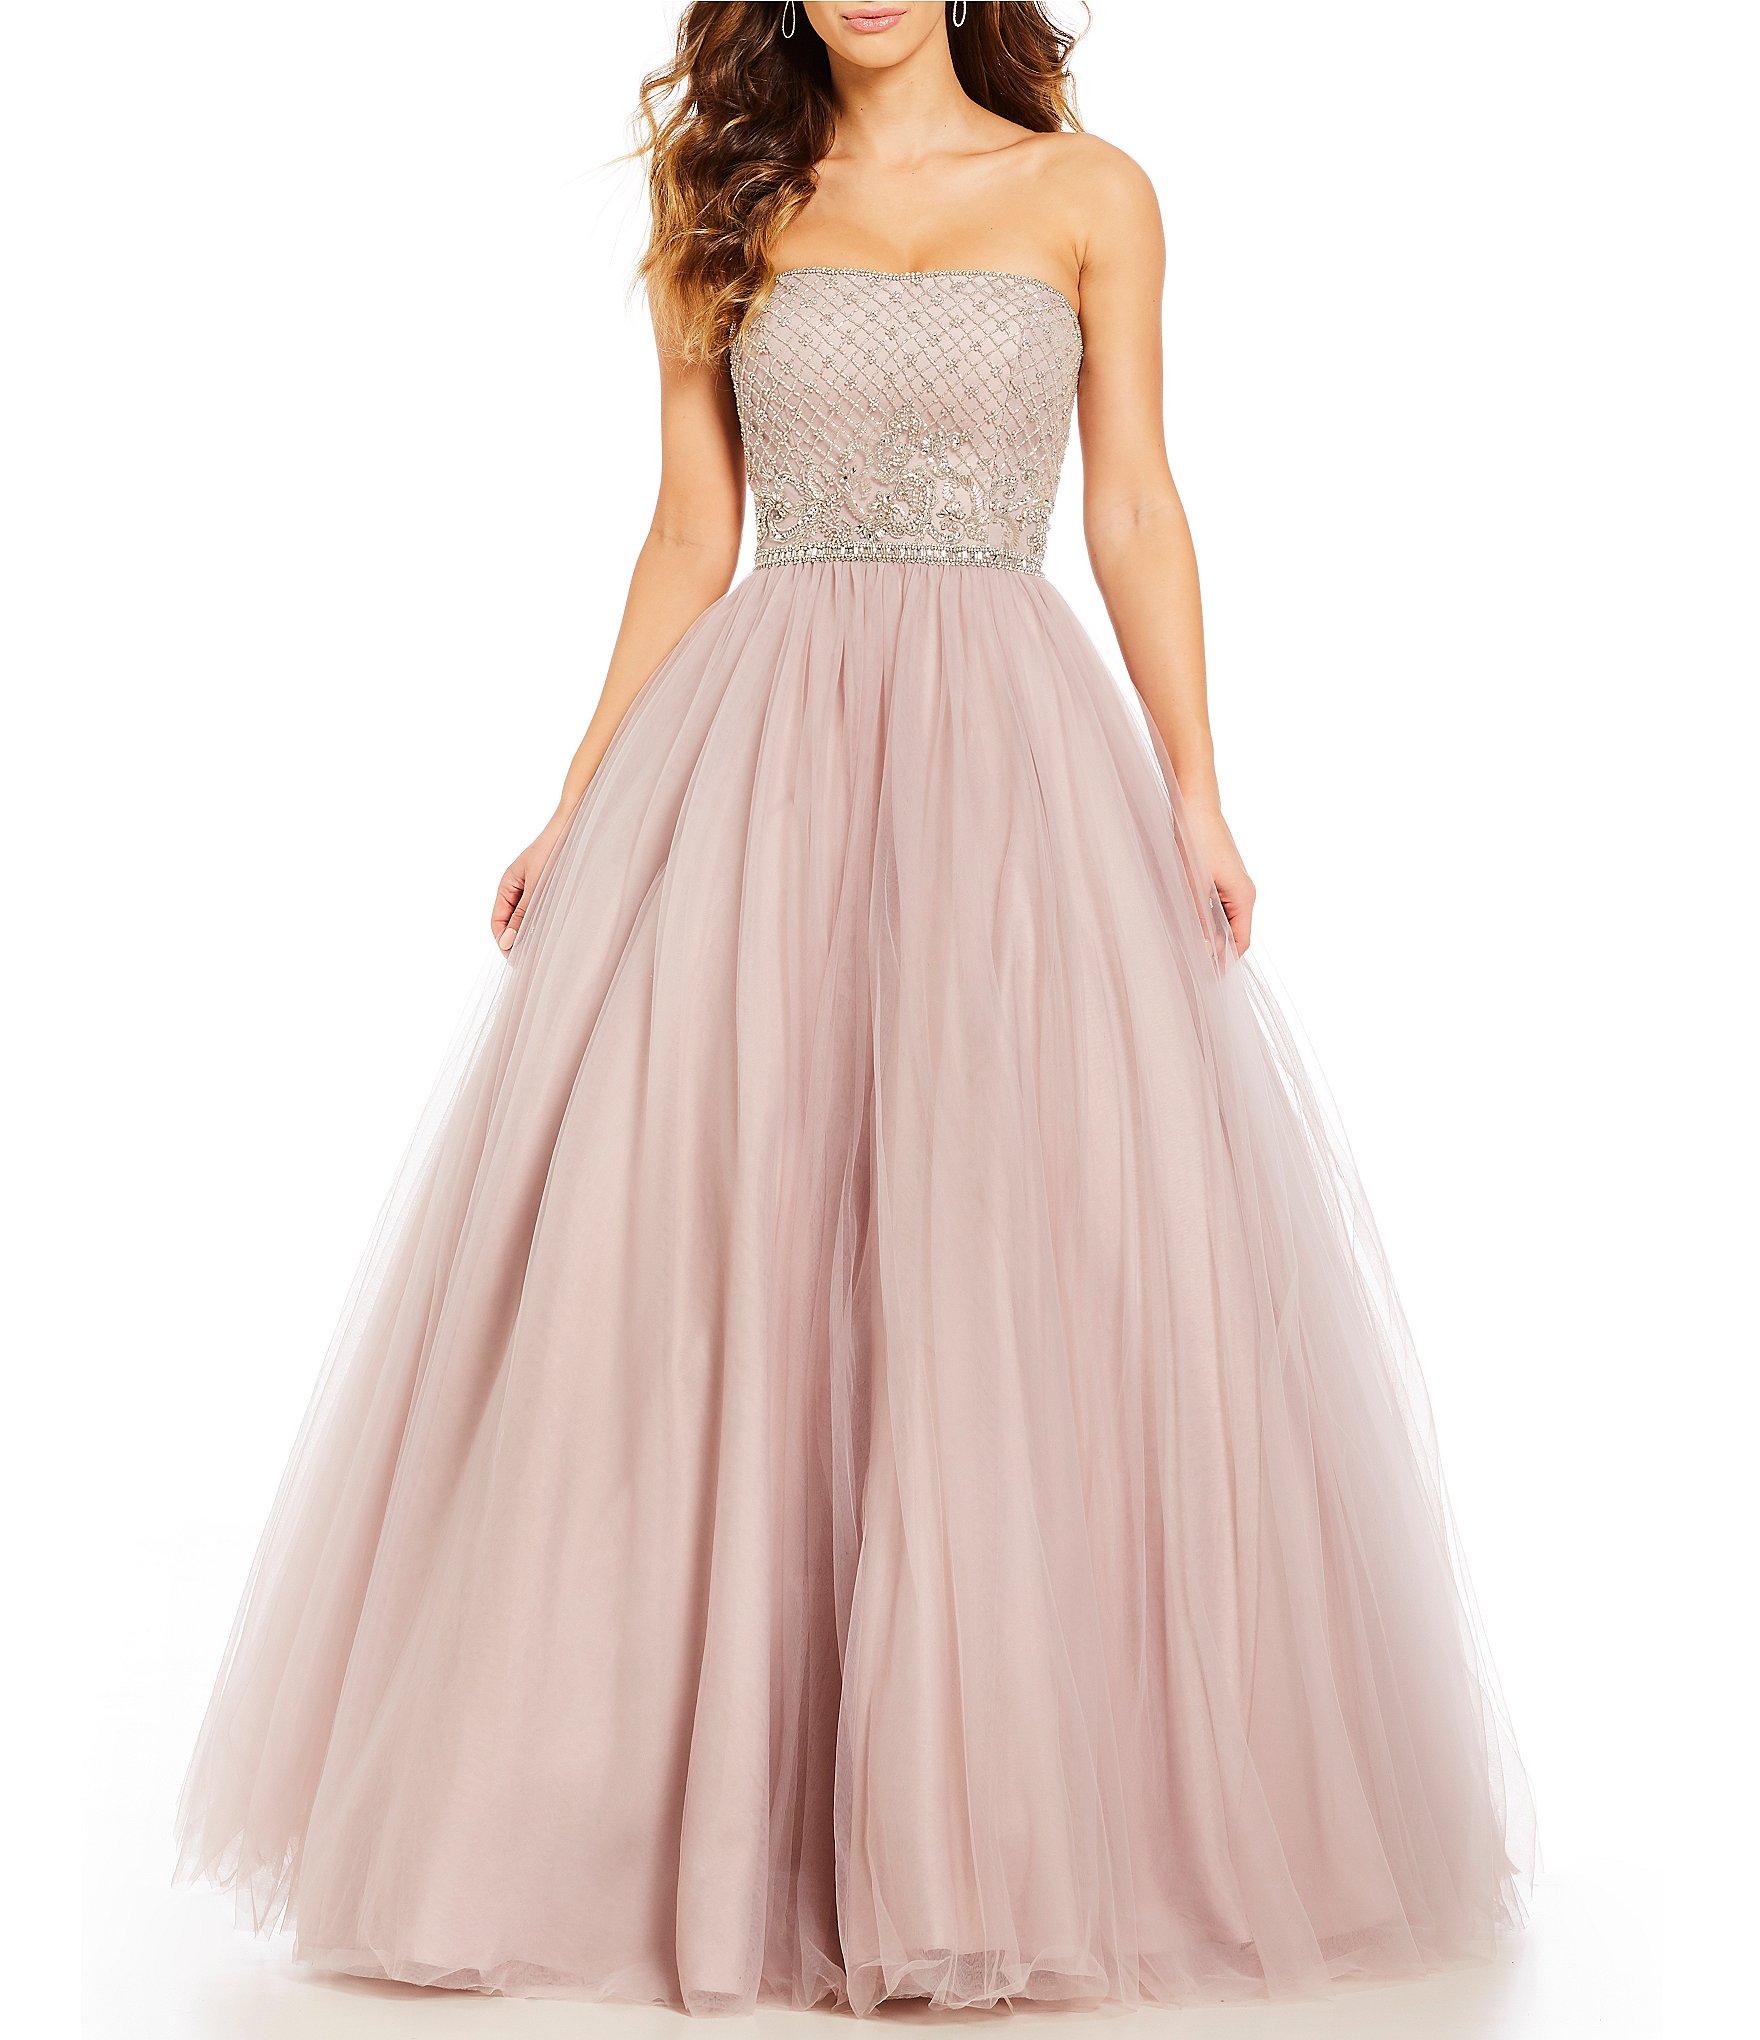 Juniors\' Long Prom & Formal Dresses   Dillards